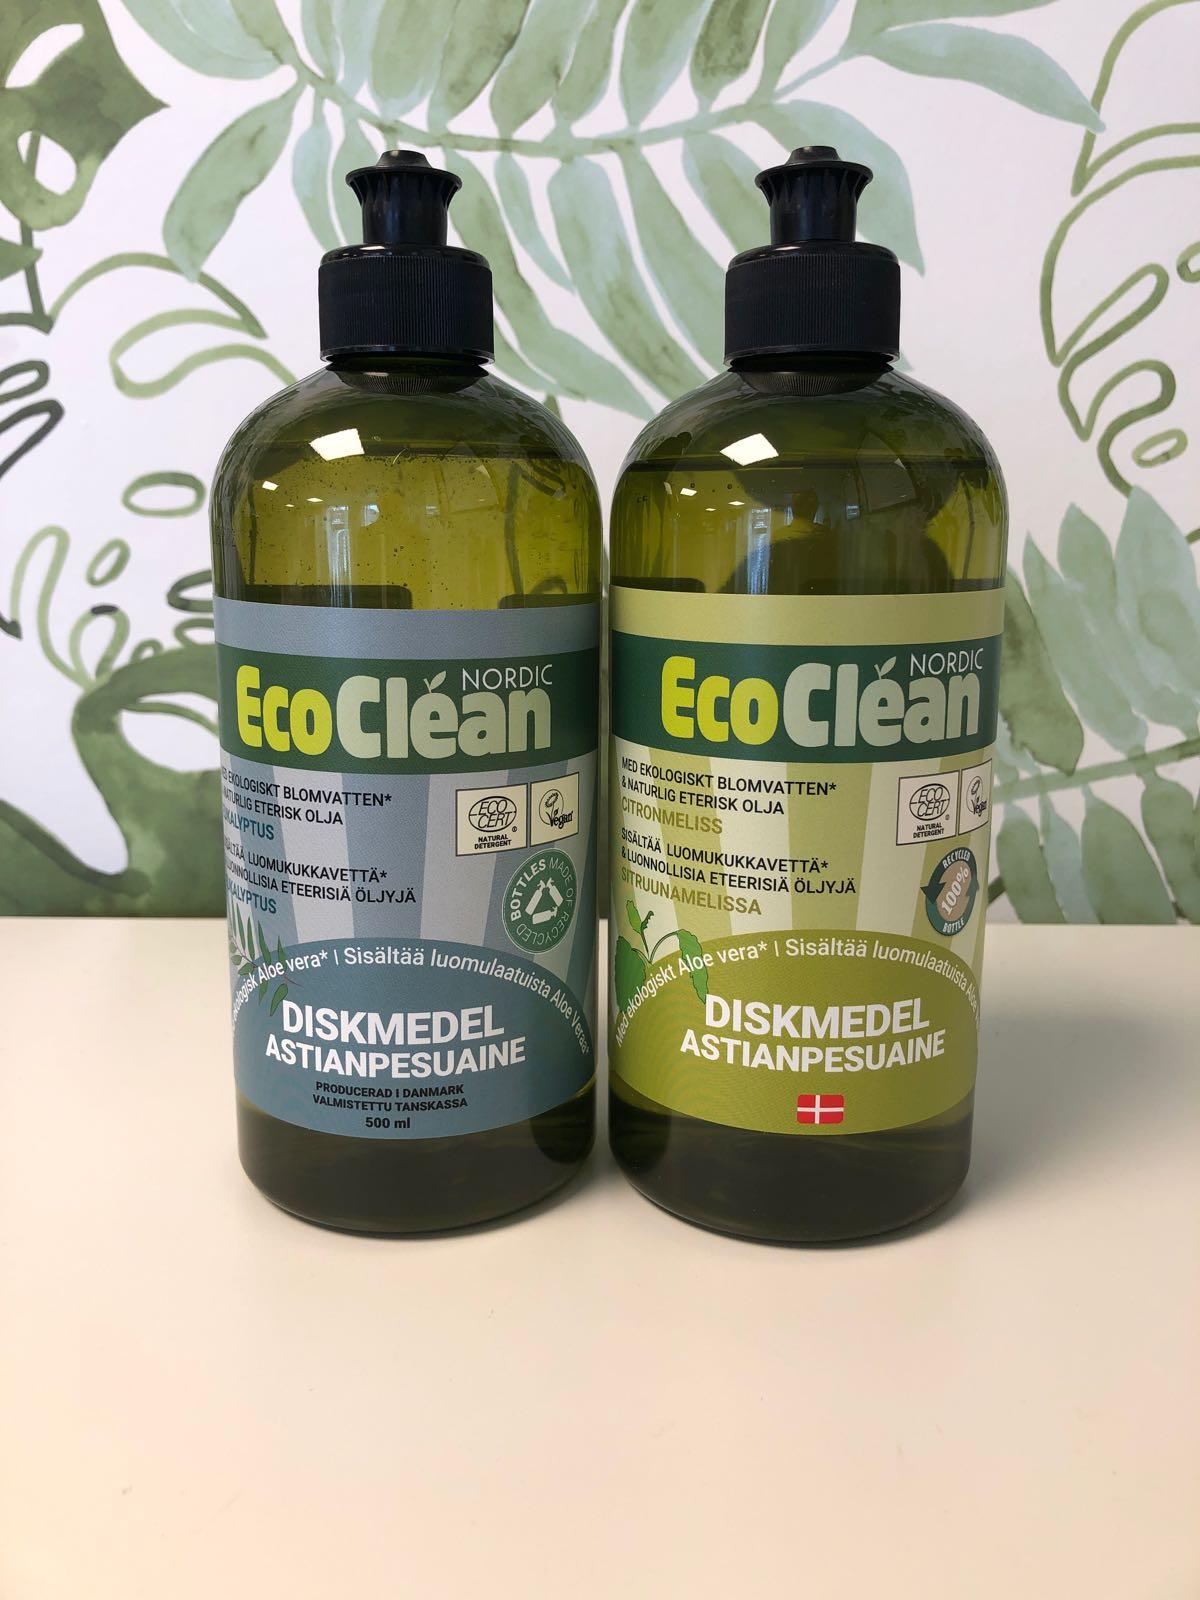 EcoClean Diskmedel 500 ml